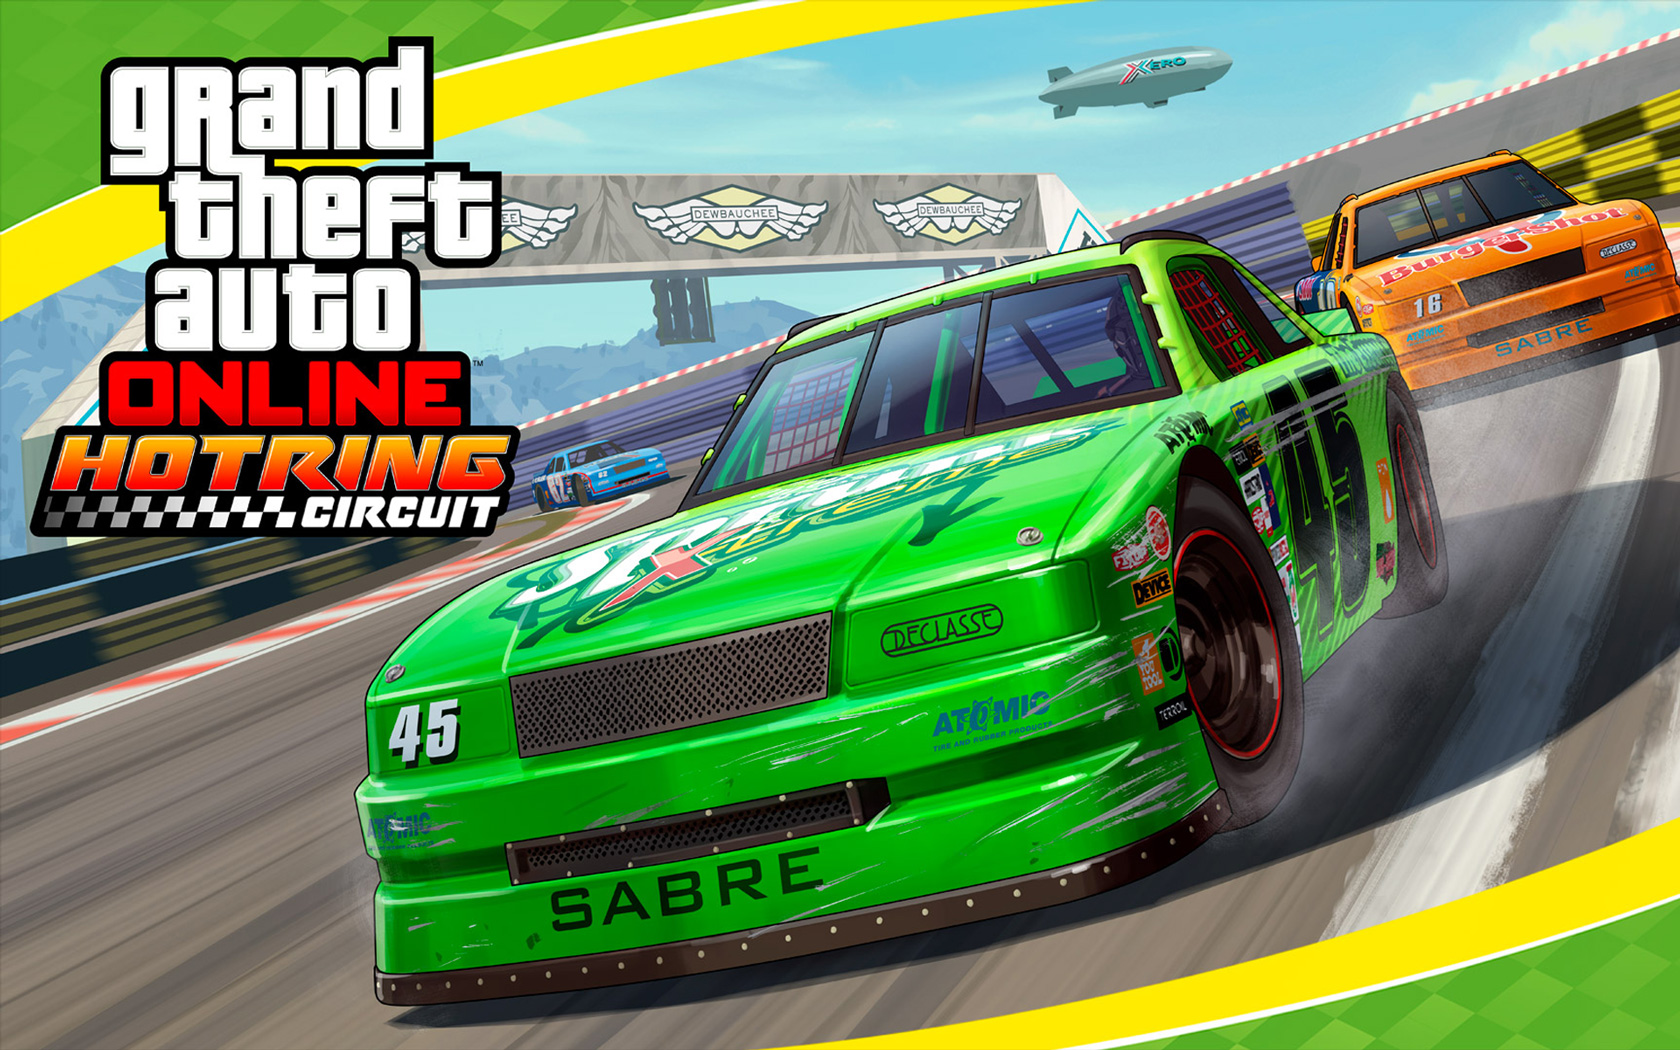 Free Grand Theft Auto V Wallpaper in 1680x1050